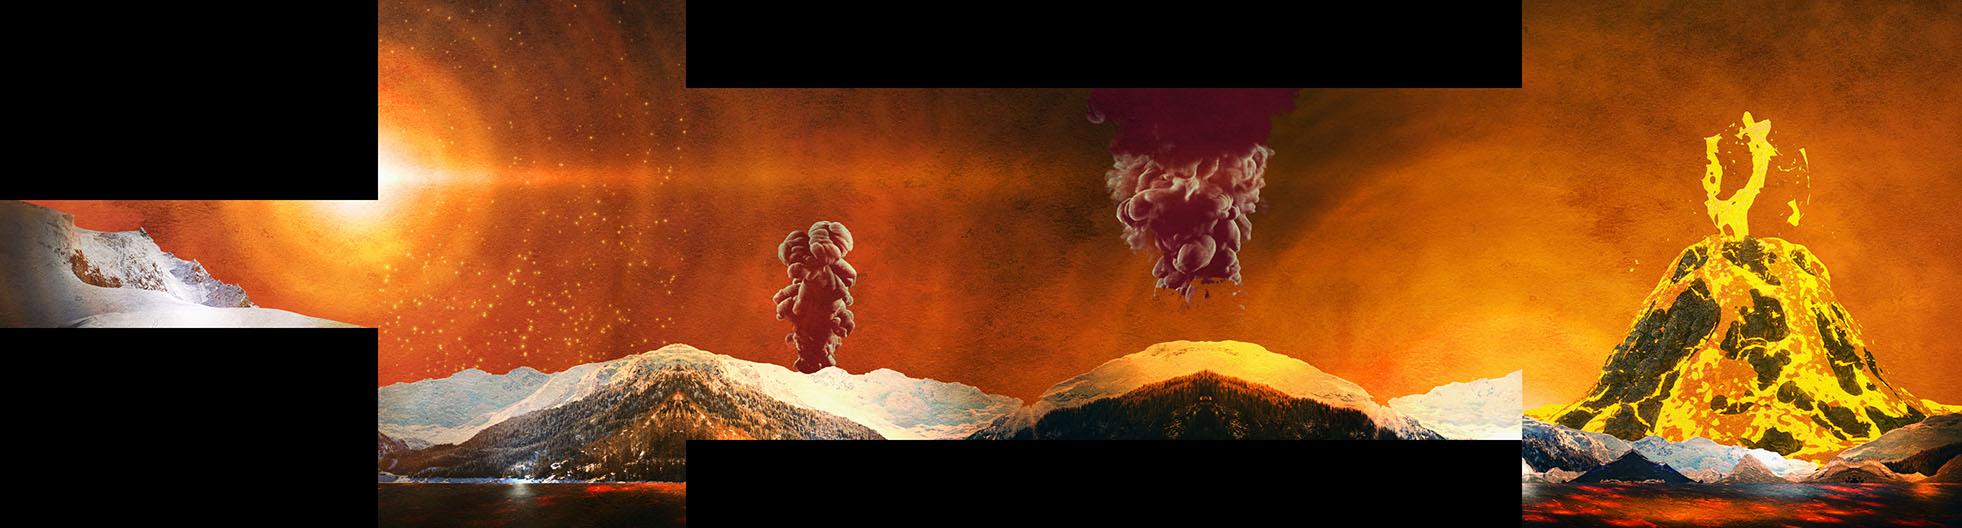 Volcano - Got Talent Israel by Elad Magdasi